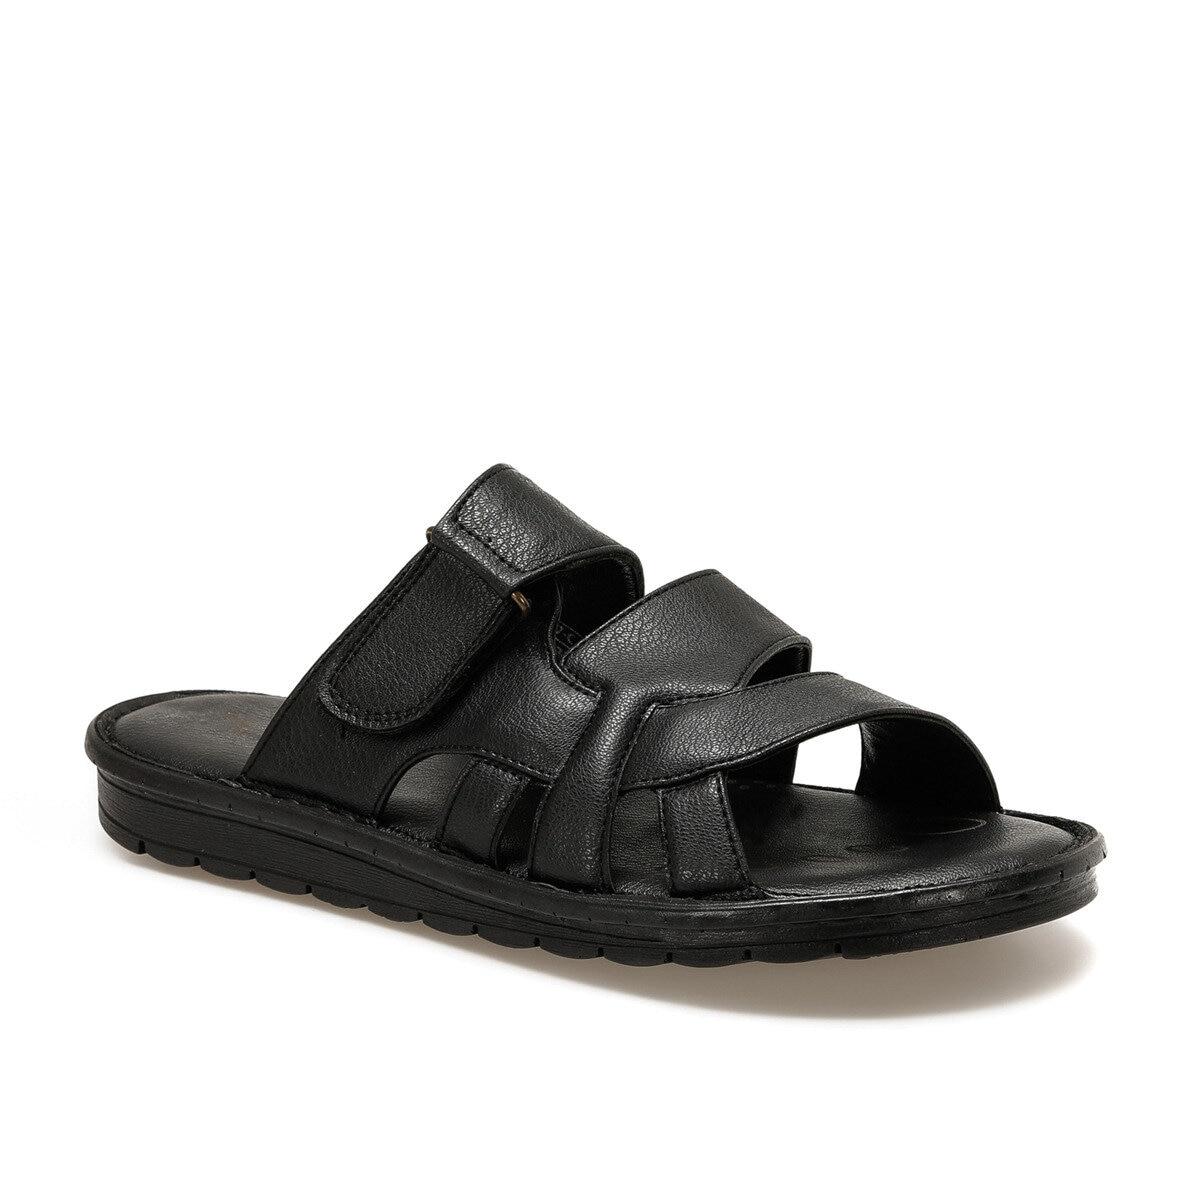 FLO 107 C Black Male Slippers Flexall